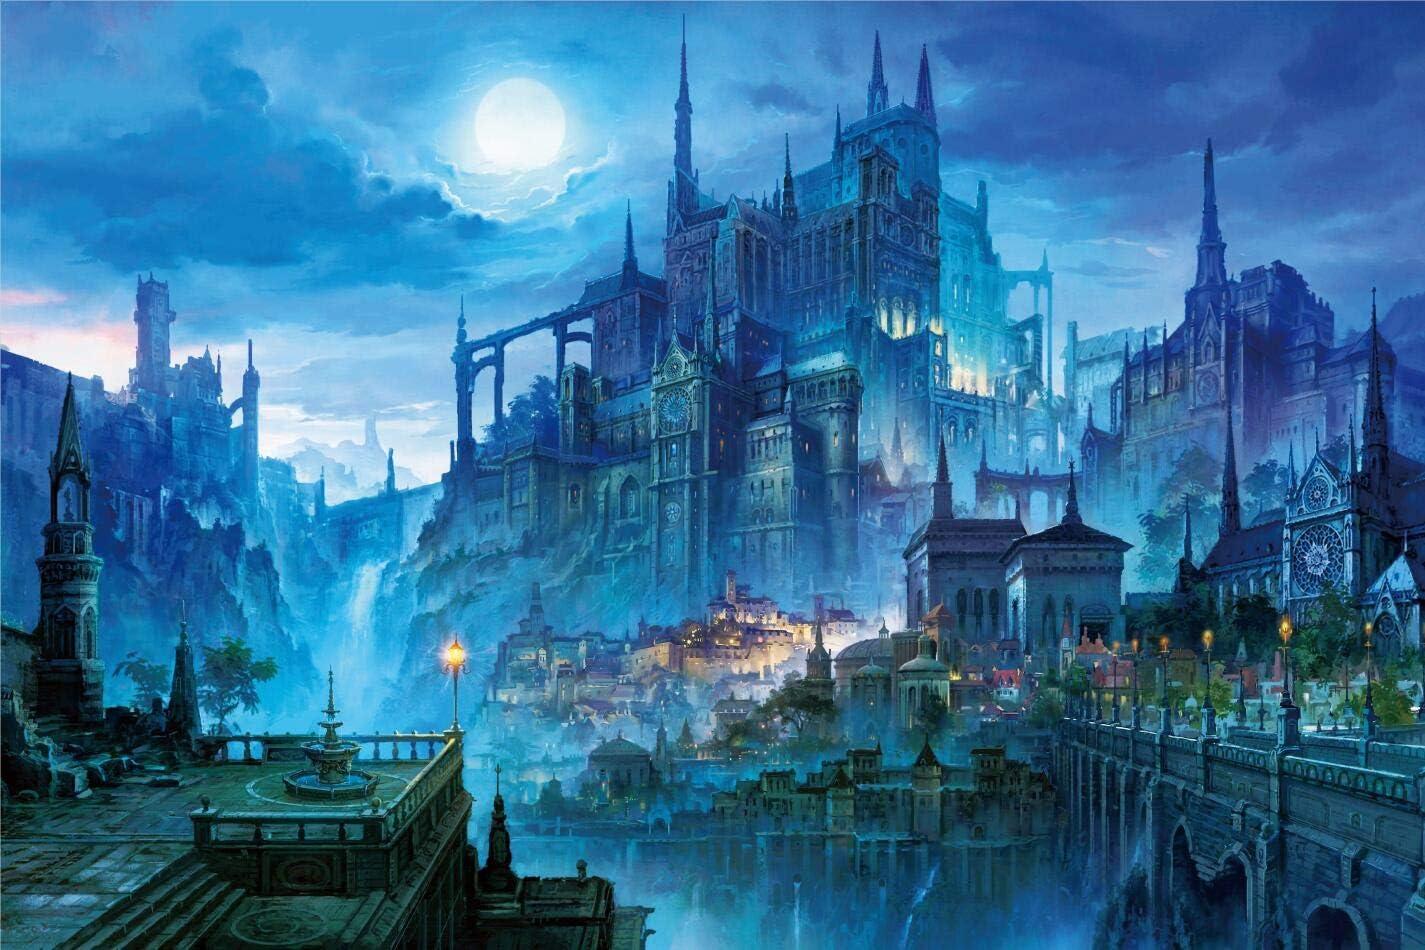 InGooooD- Tranquil Series- Castle in The Night- Basswood Jigsaw Puzzles 1000 Piezas para Adultos Entretenimiento Juguetes de Rompecabezas de Madera